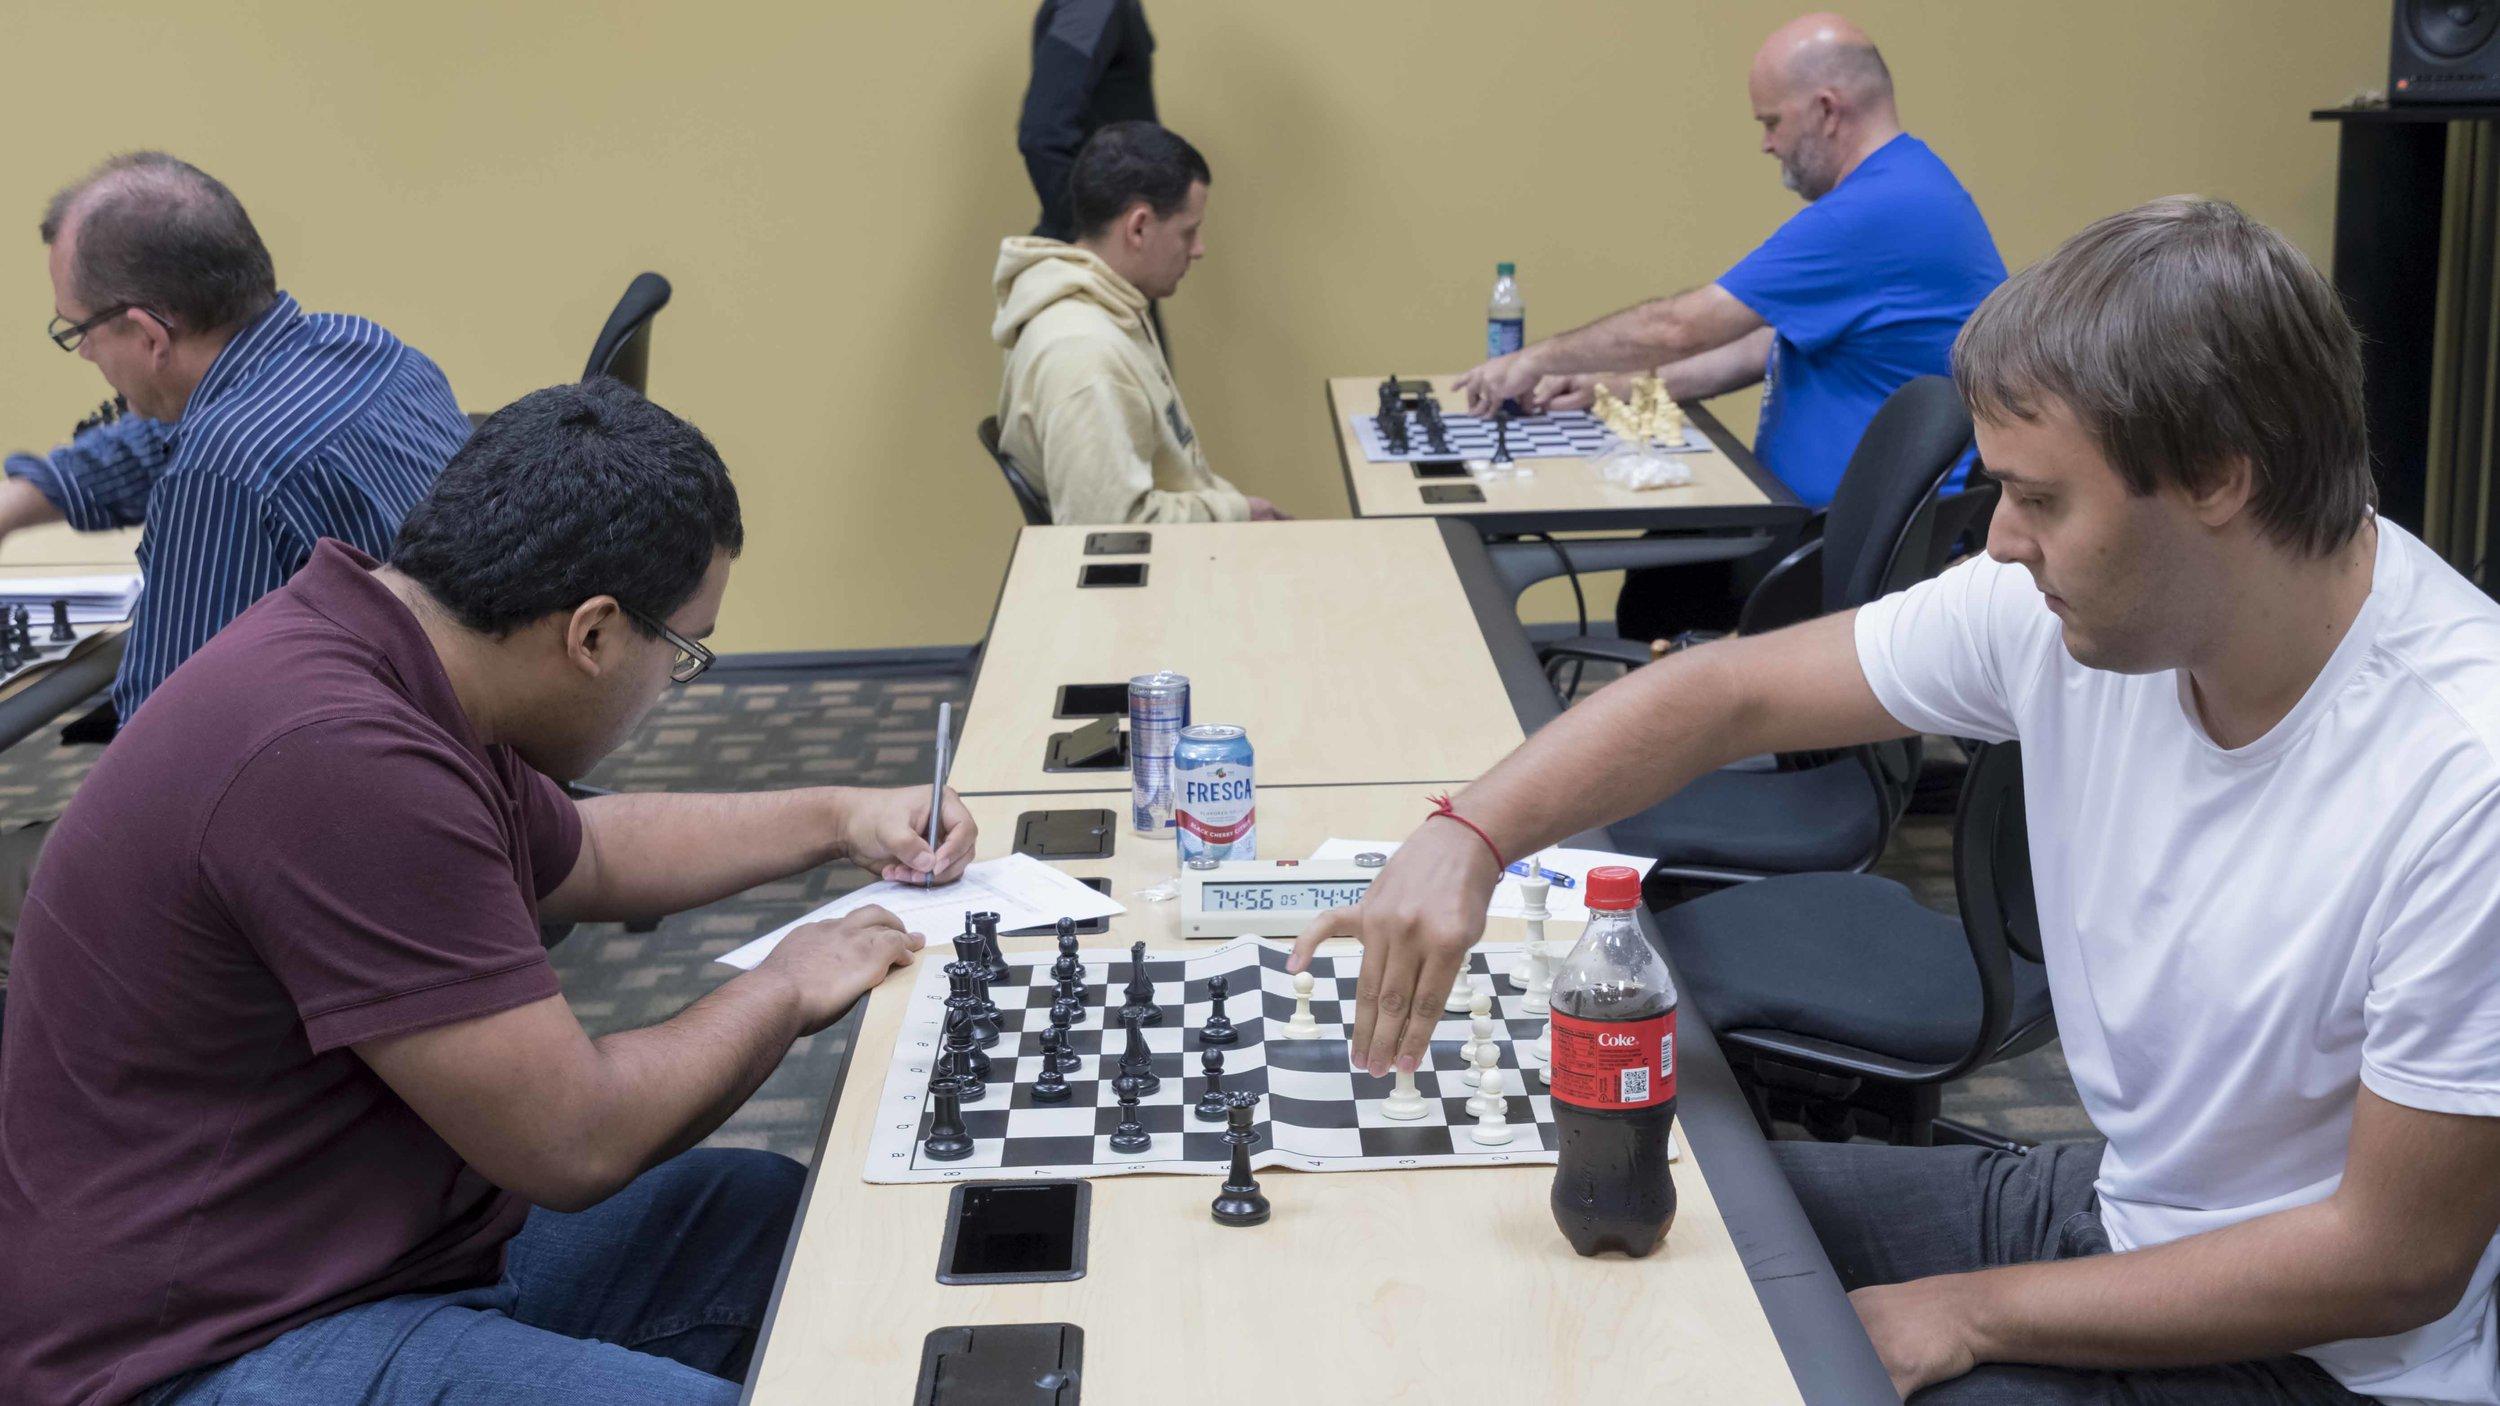 Round 4, Board 1, Makaio Krienke (2187) (L) vs NM Martin Hansen (2212) (R)